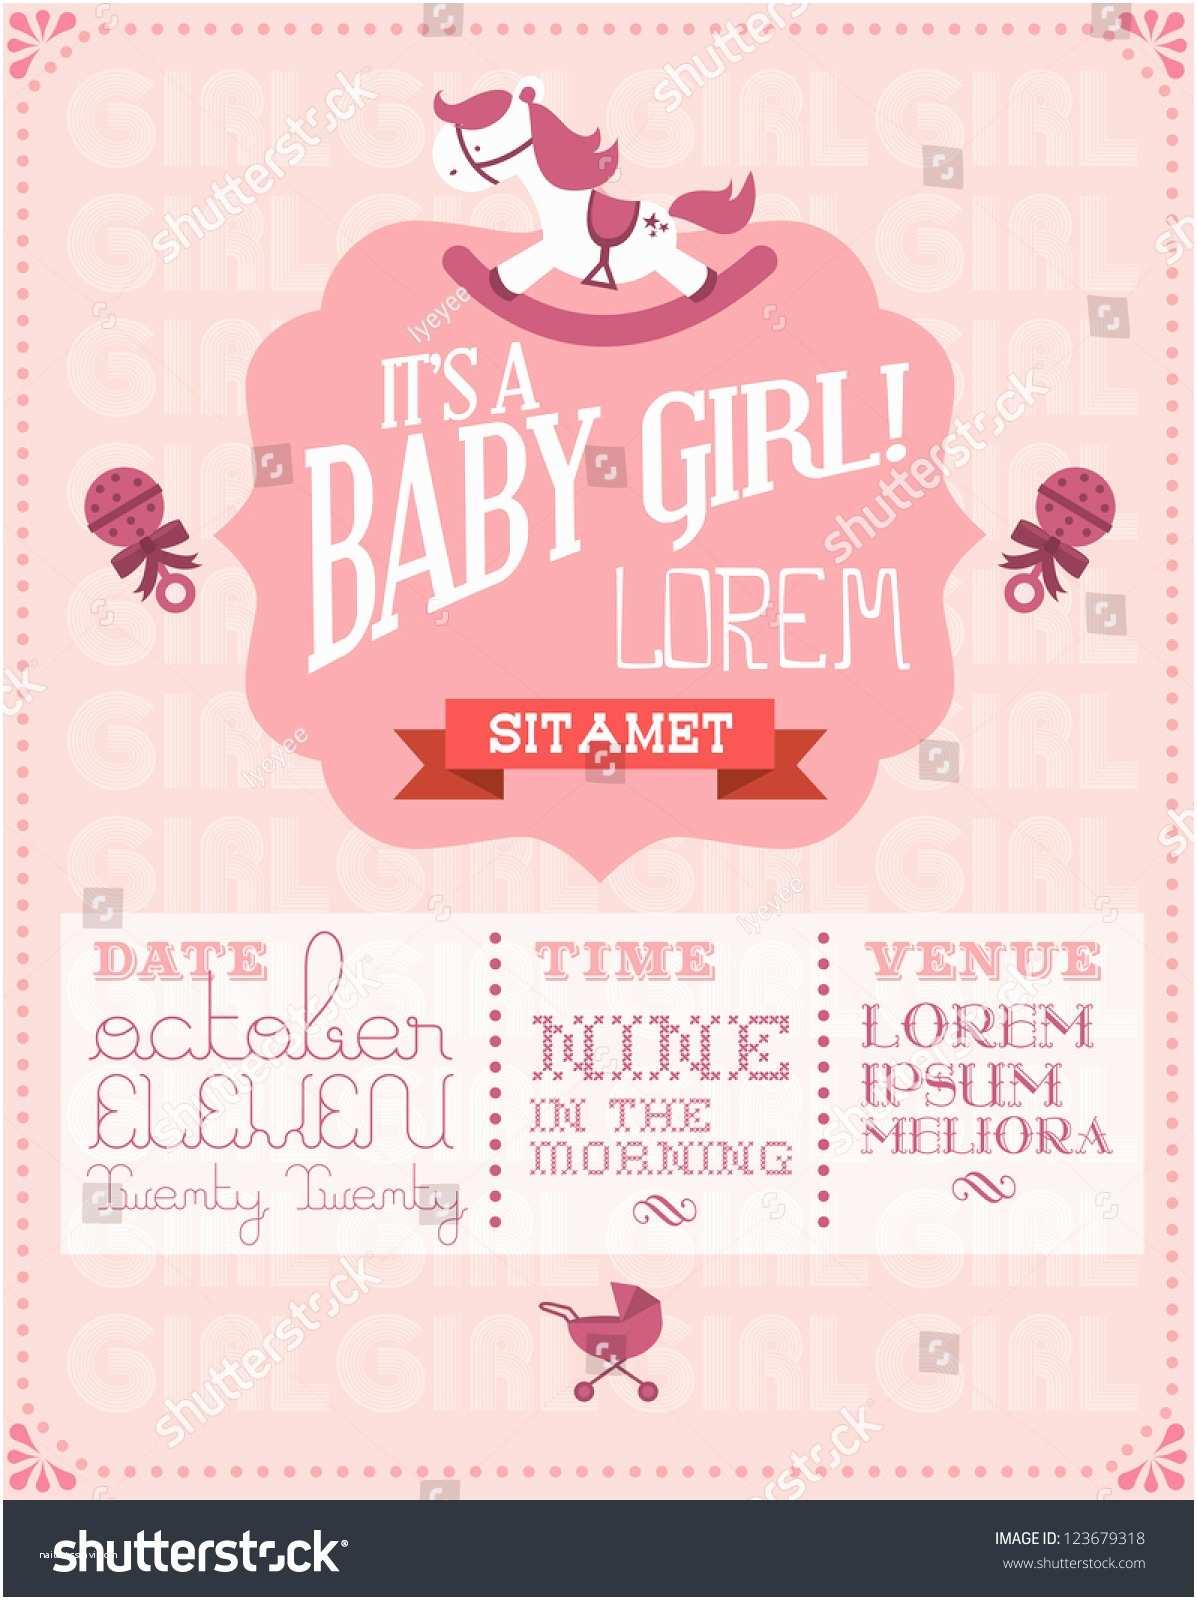 Baby Shower Invitations Girl Baby Shower Invitations for Girls Templates – Gangcraft